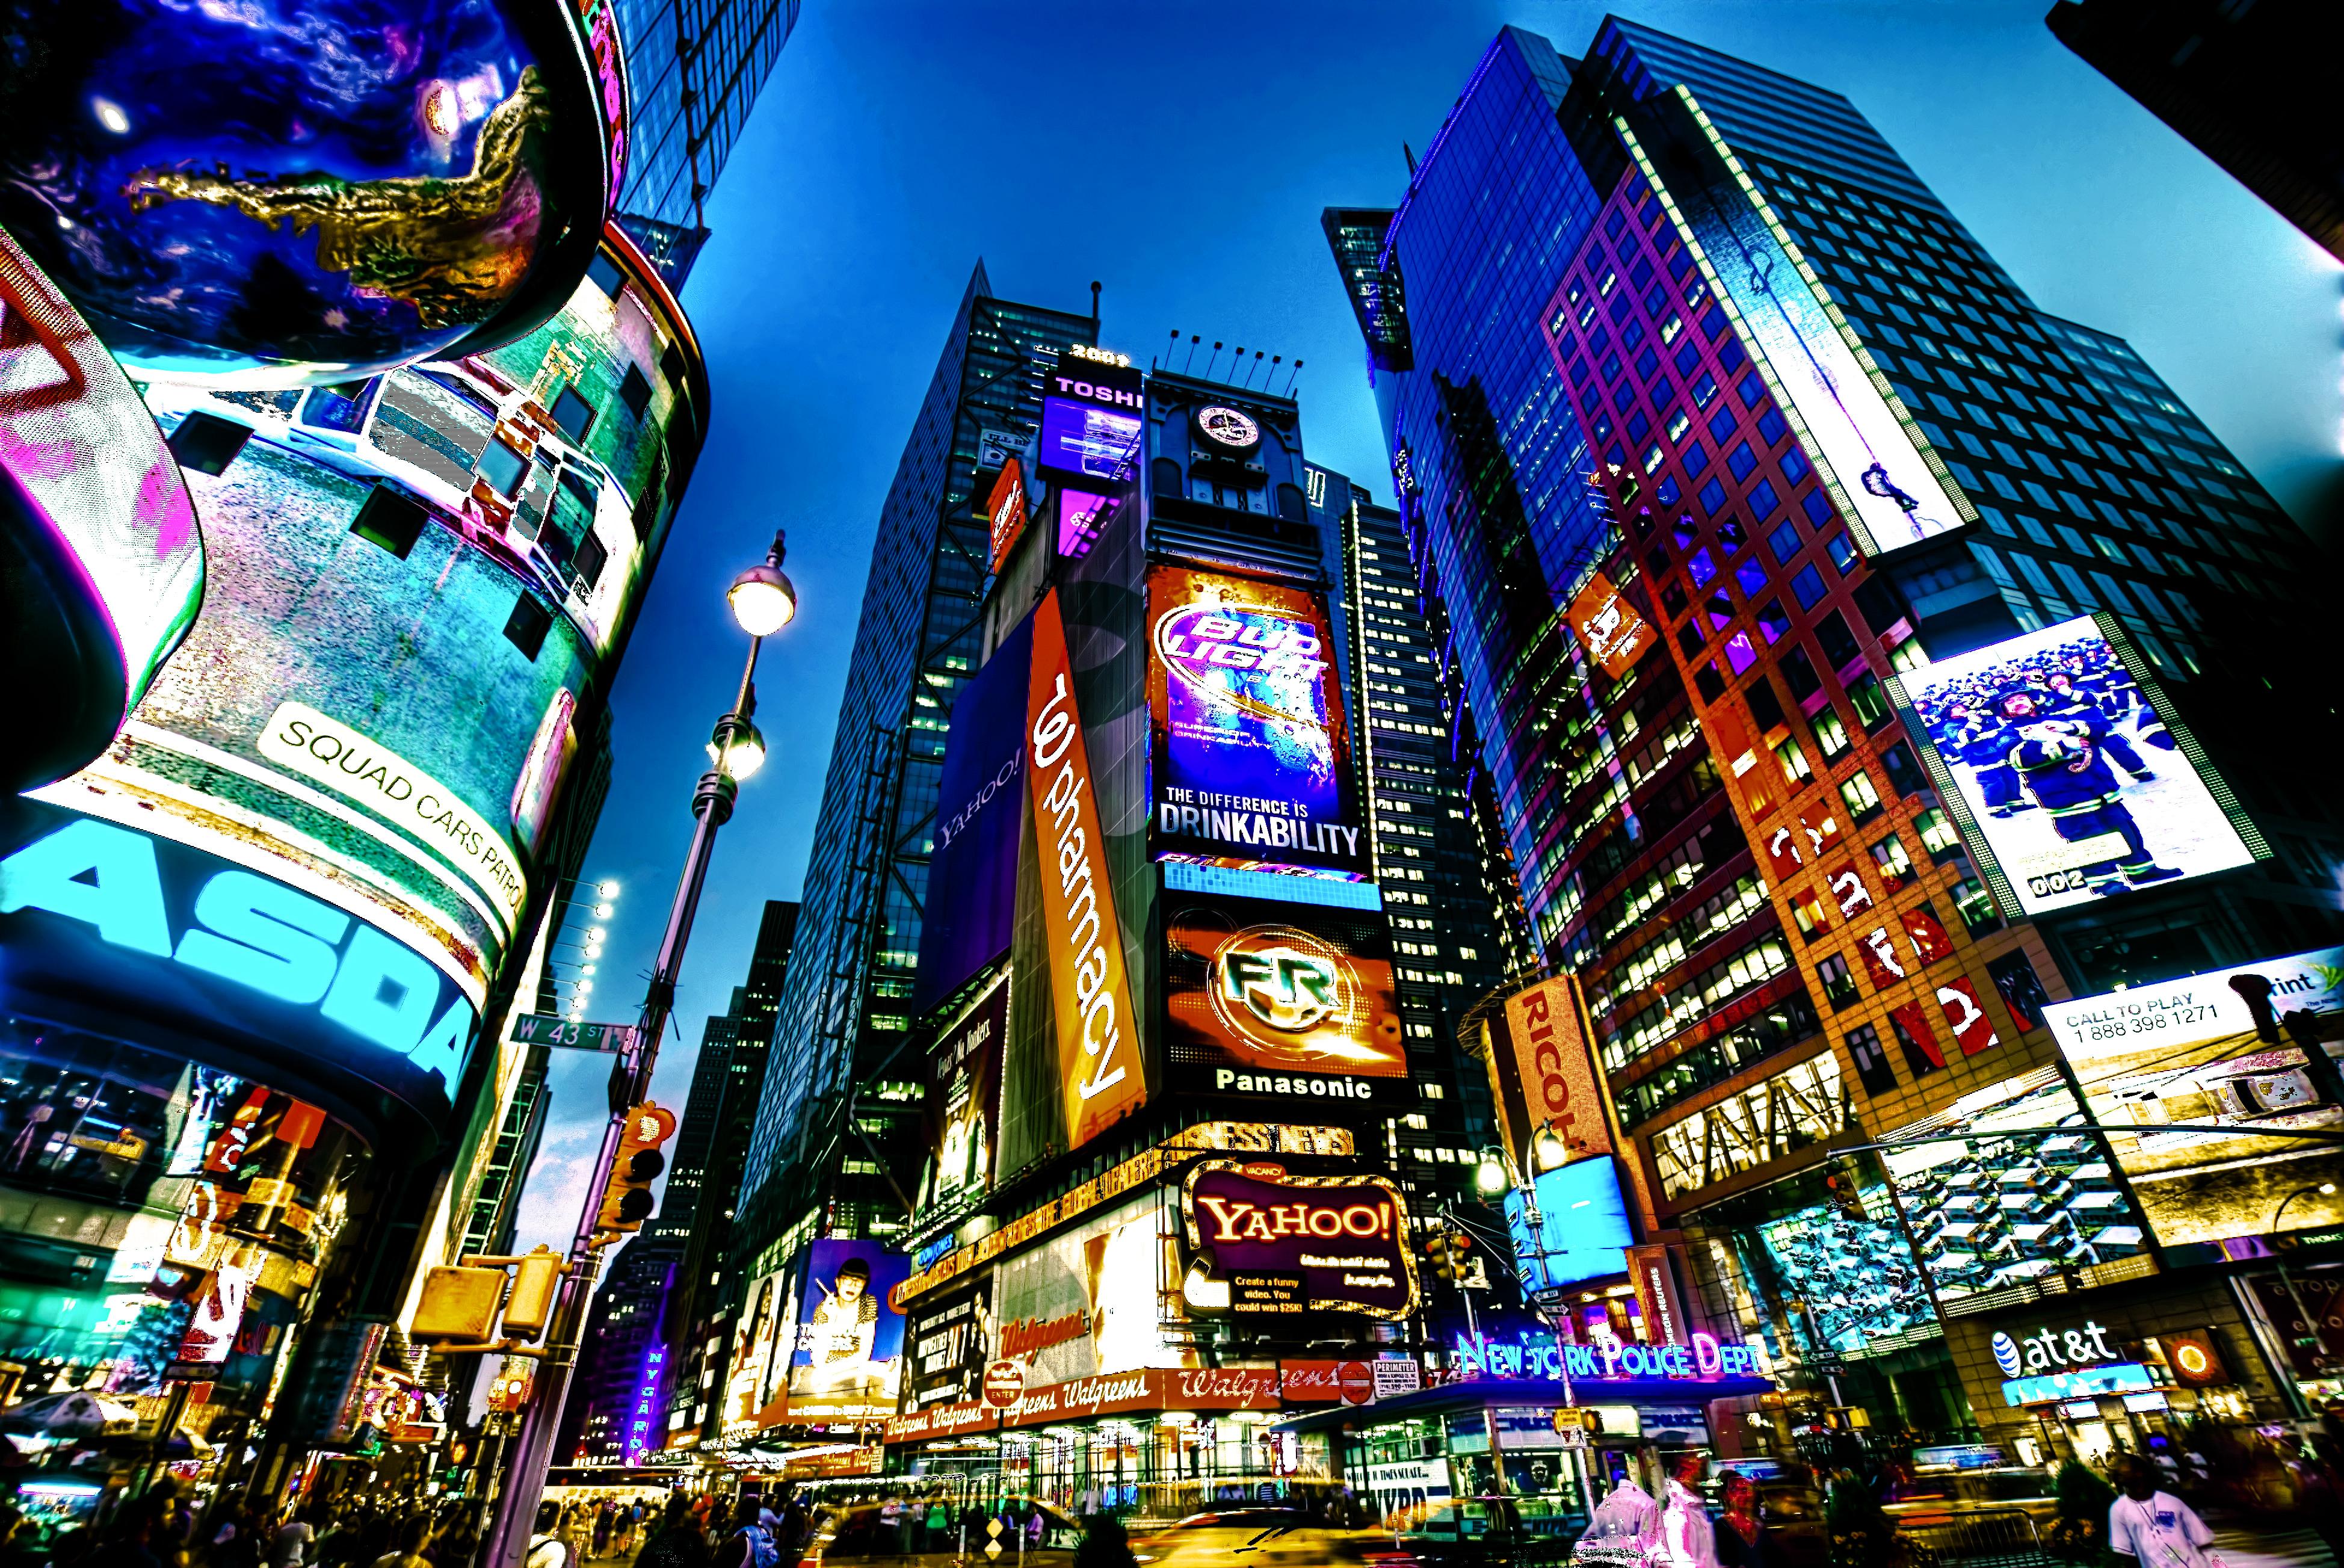 Times_Square__New_York_City_(HDR).jpg